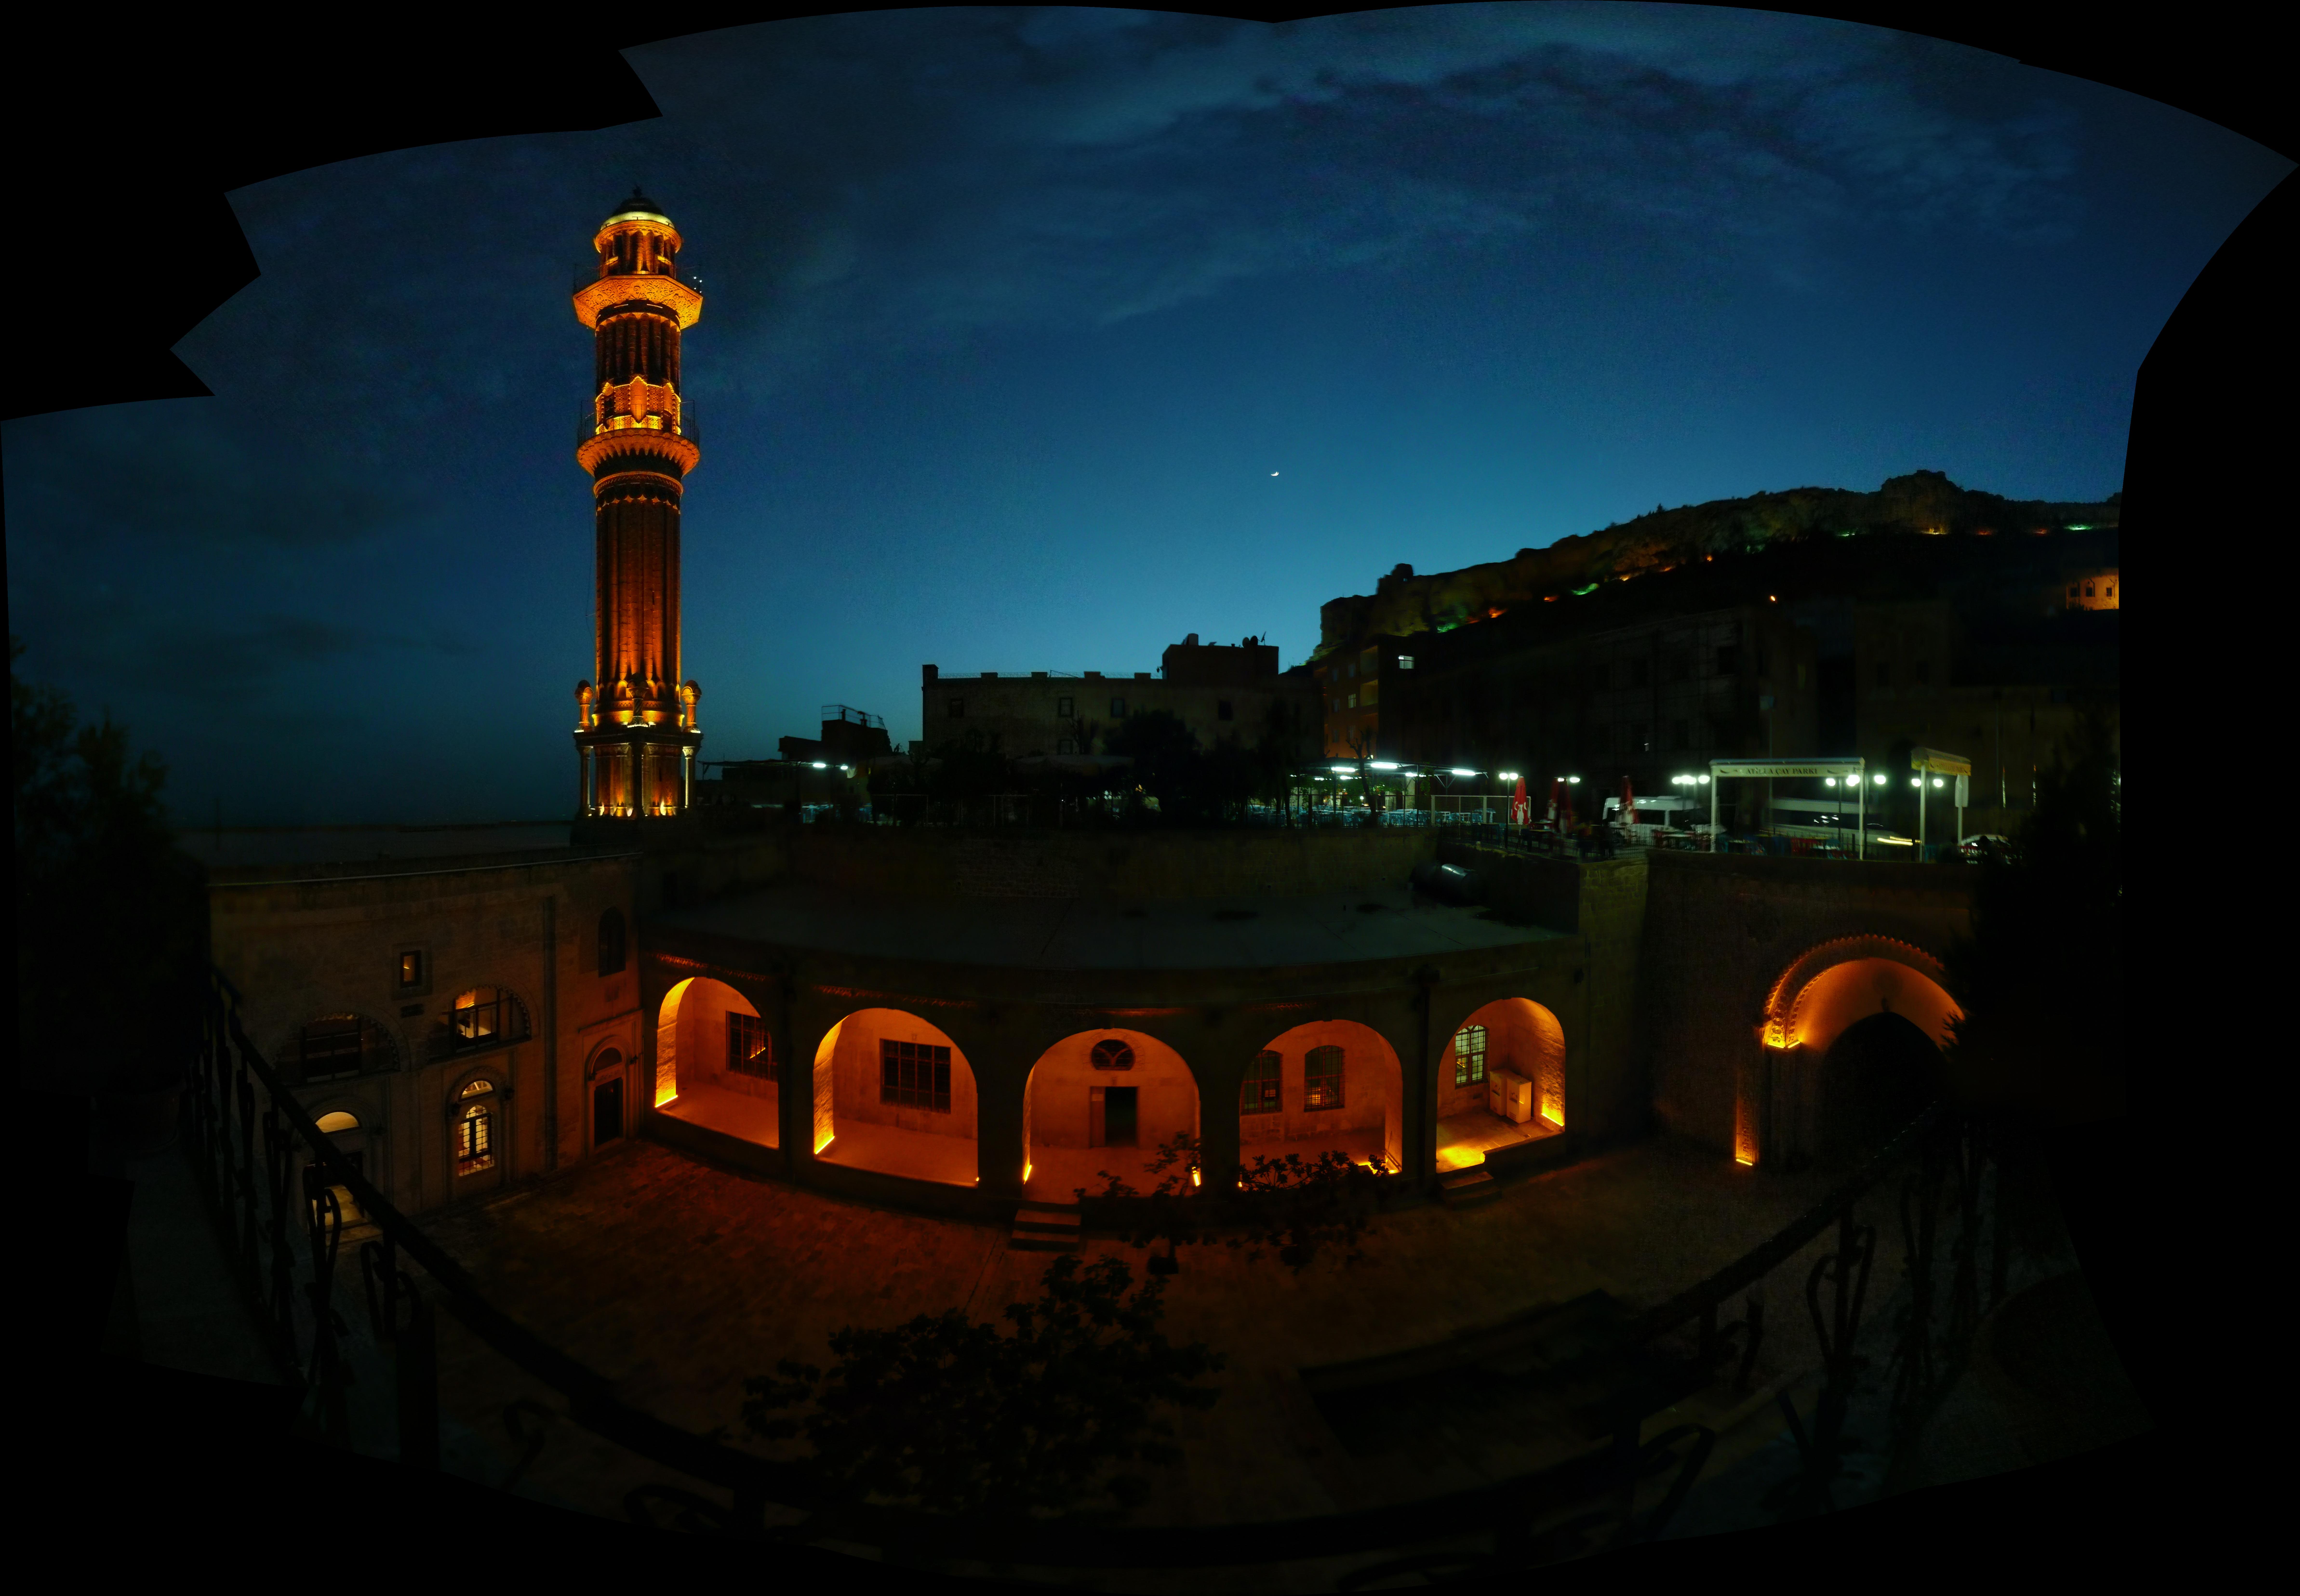 File:Mardin 1350660 1350692 33 images.jpg - Wikimedia Commons